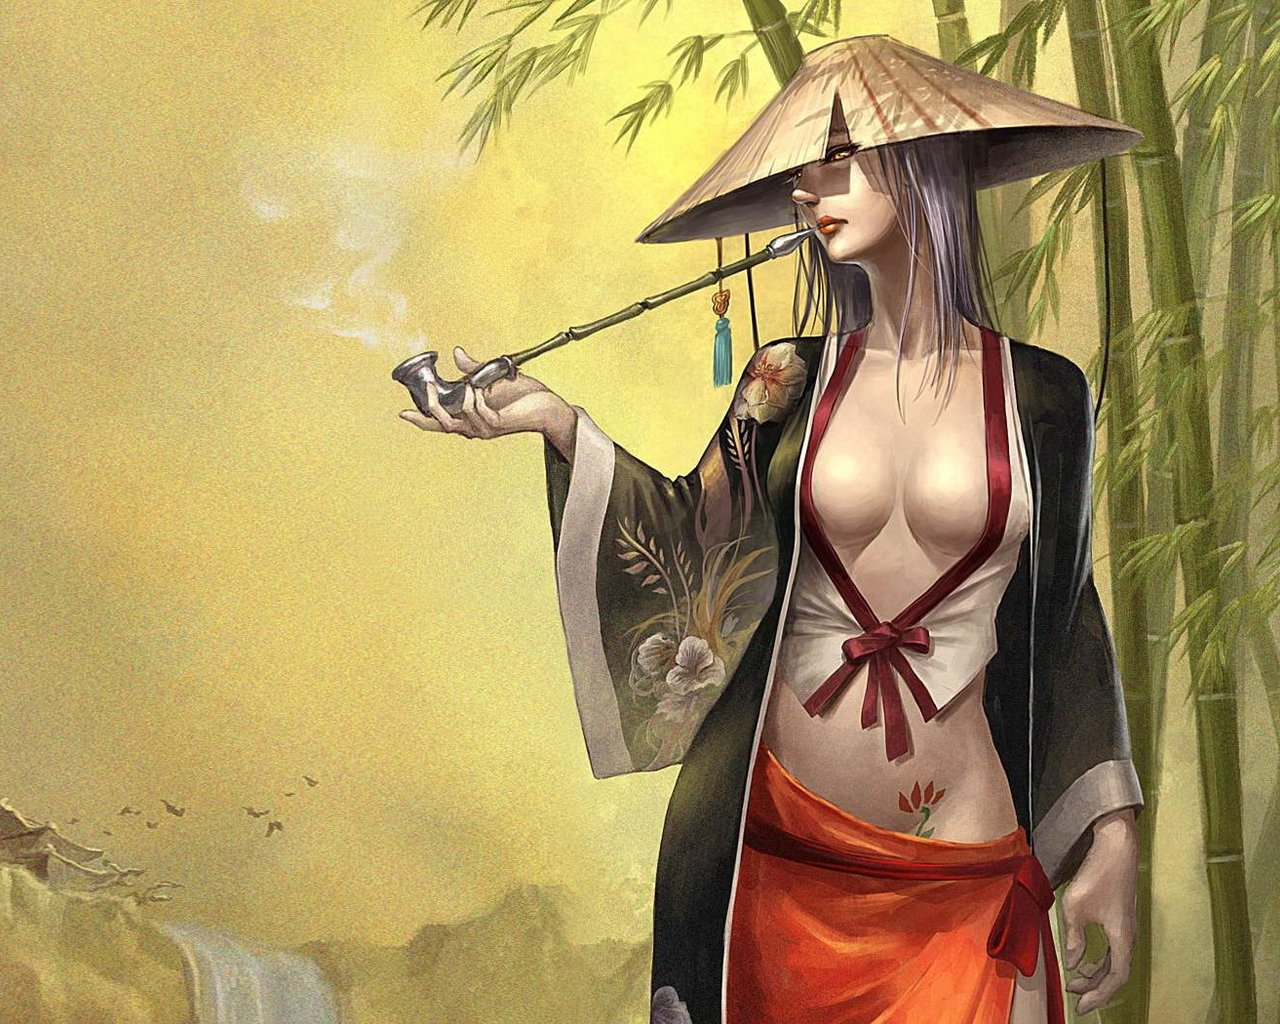 Drawn samurai desktop background Woman japanese  Asian play